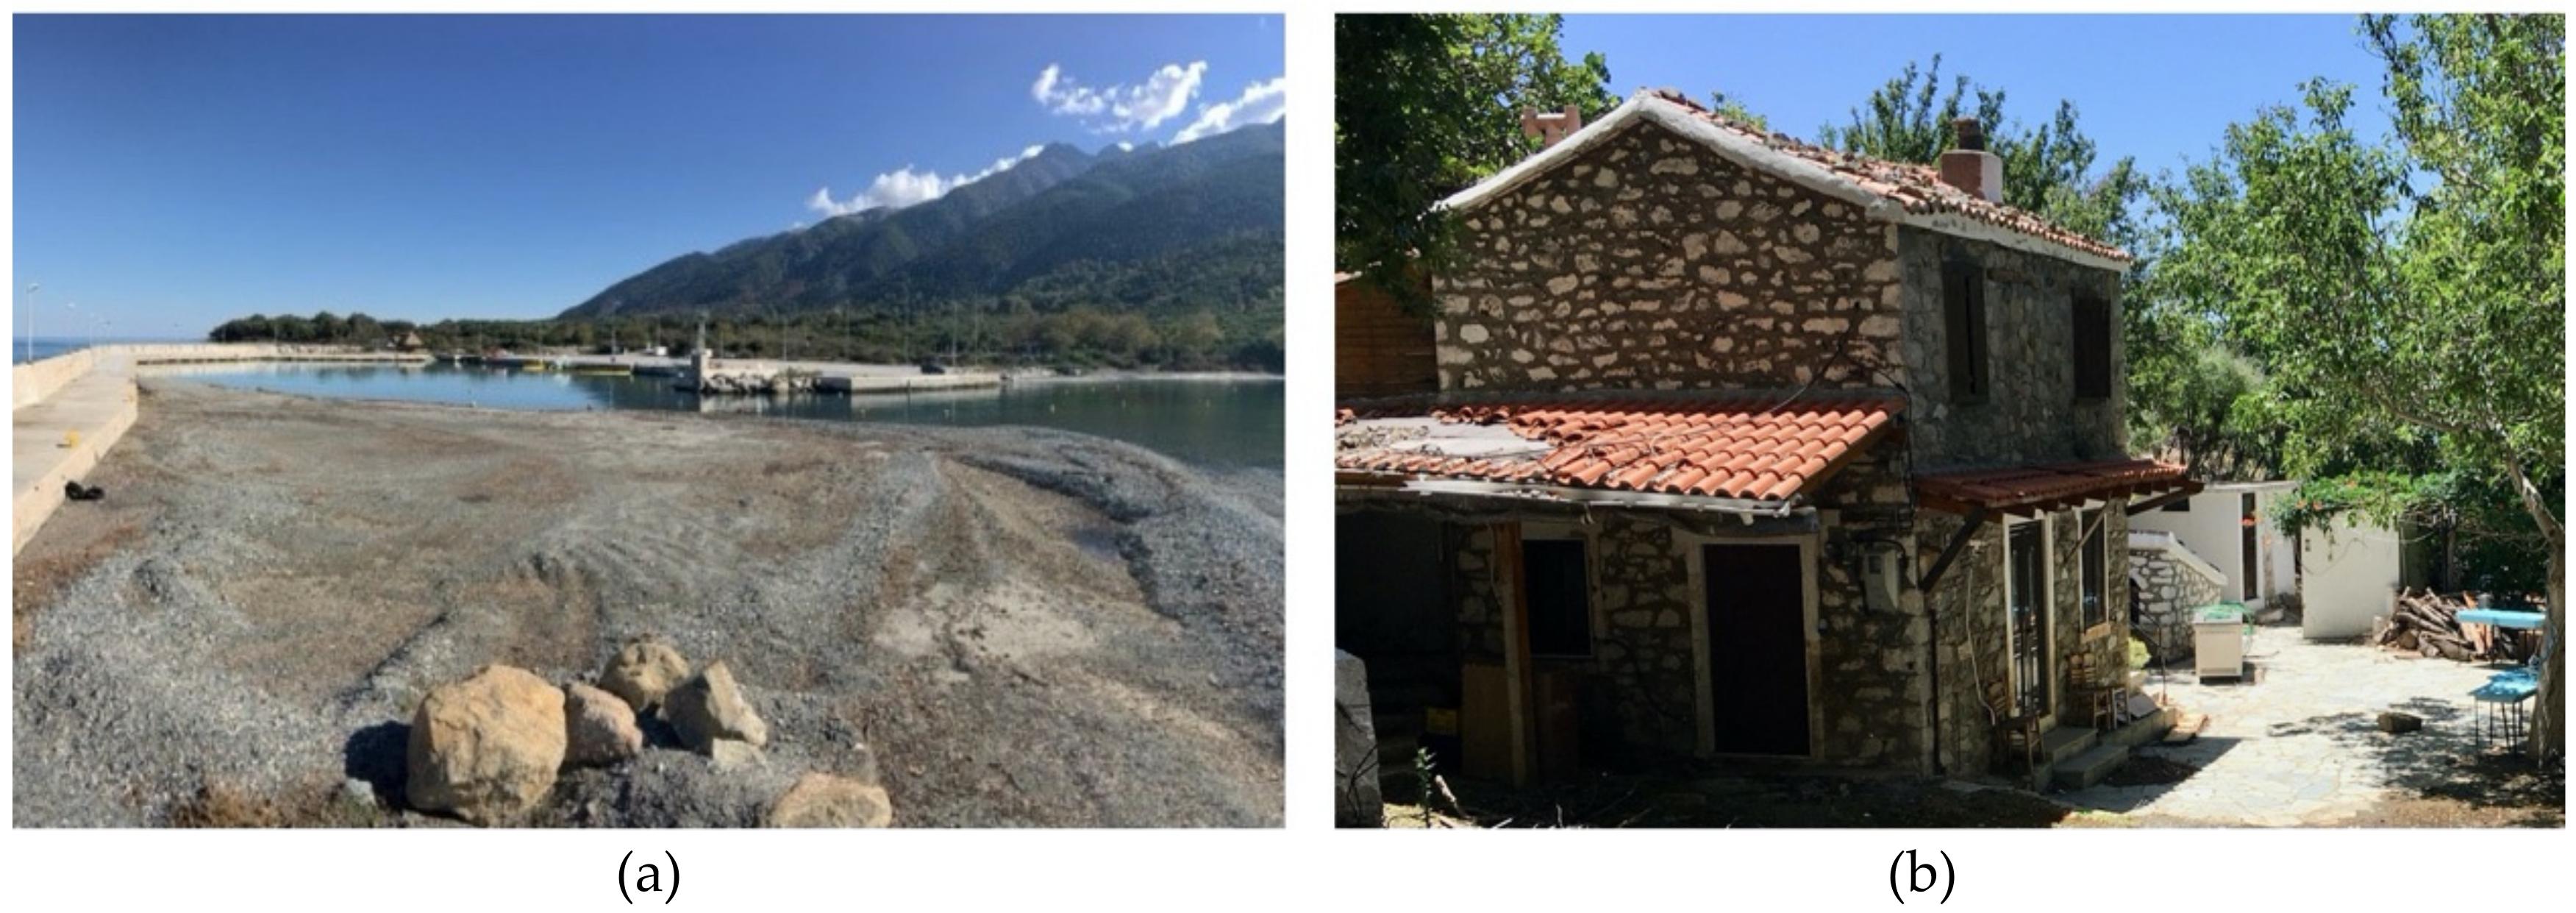 Reimagining Water in the West Water Rites